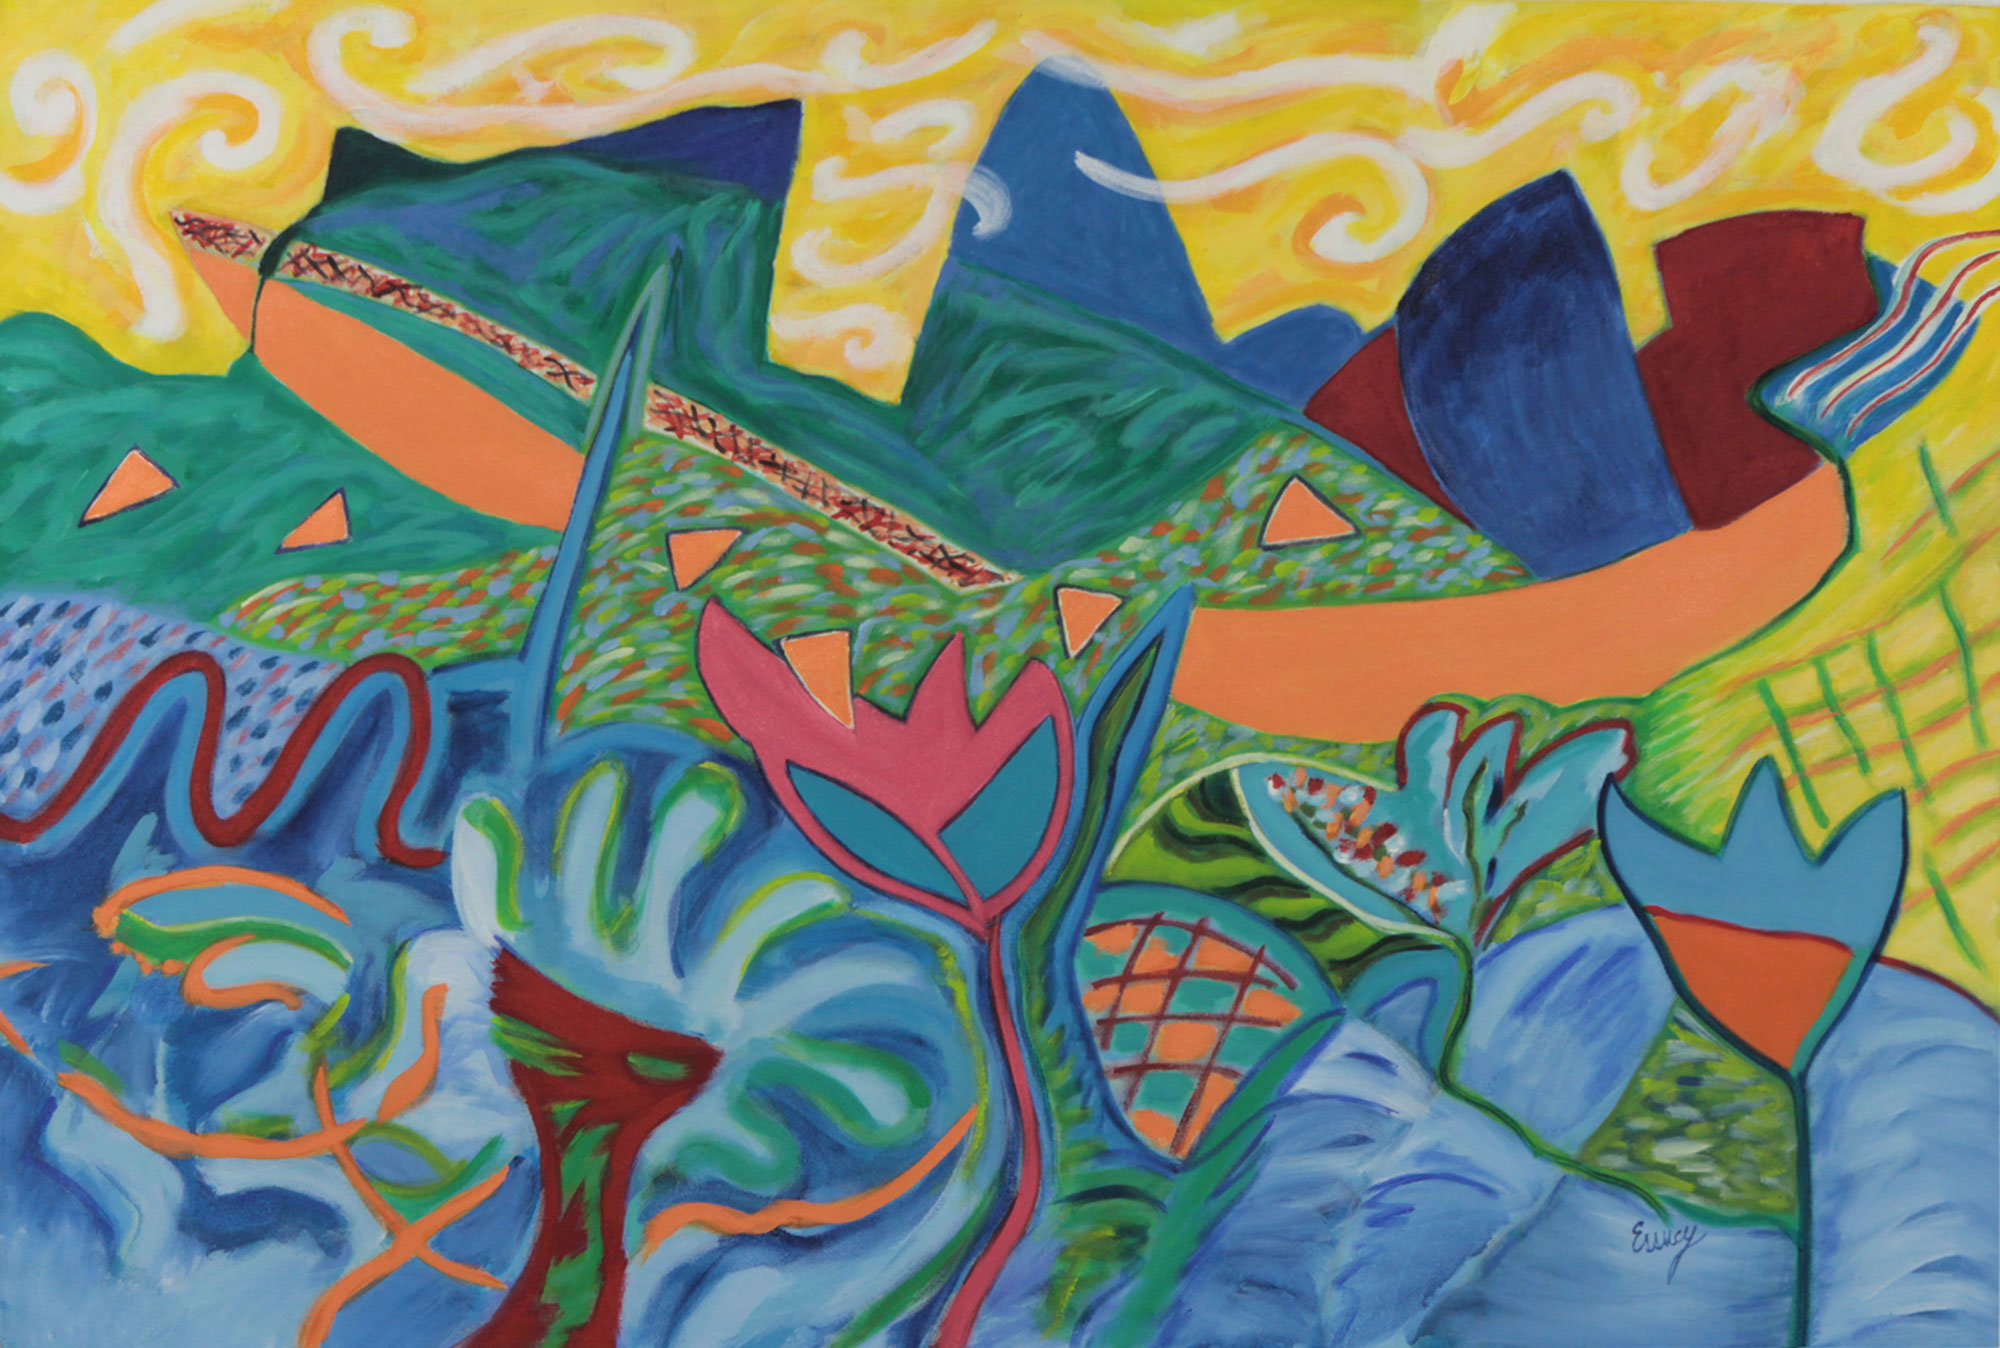 Vivid Abstract Rio de Janeiro Landscape in Blue and Yellow, 'Rio de Janeiro II' Expressionism Original Expressionist fine art on canvas